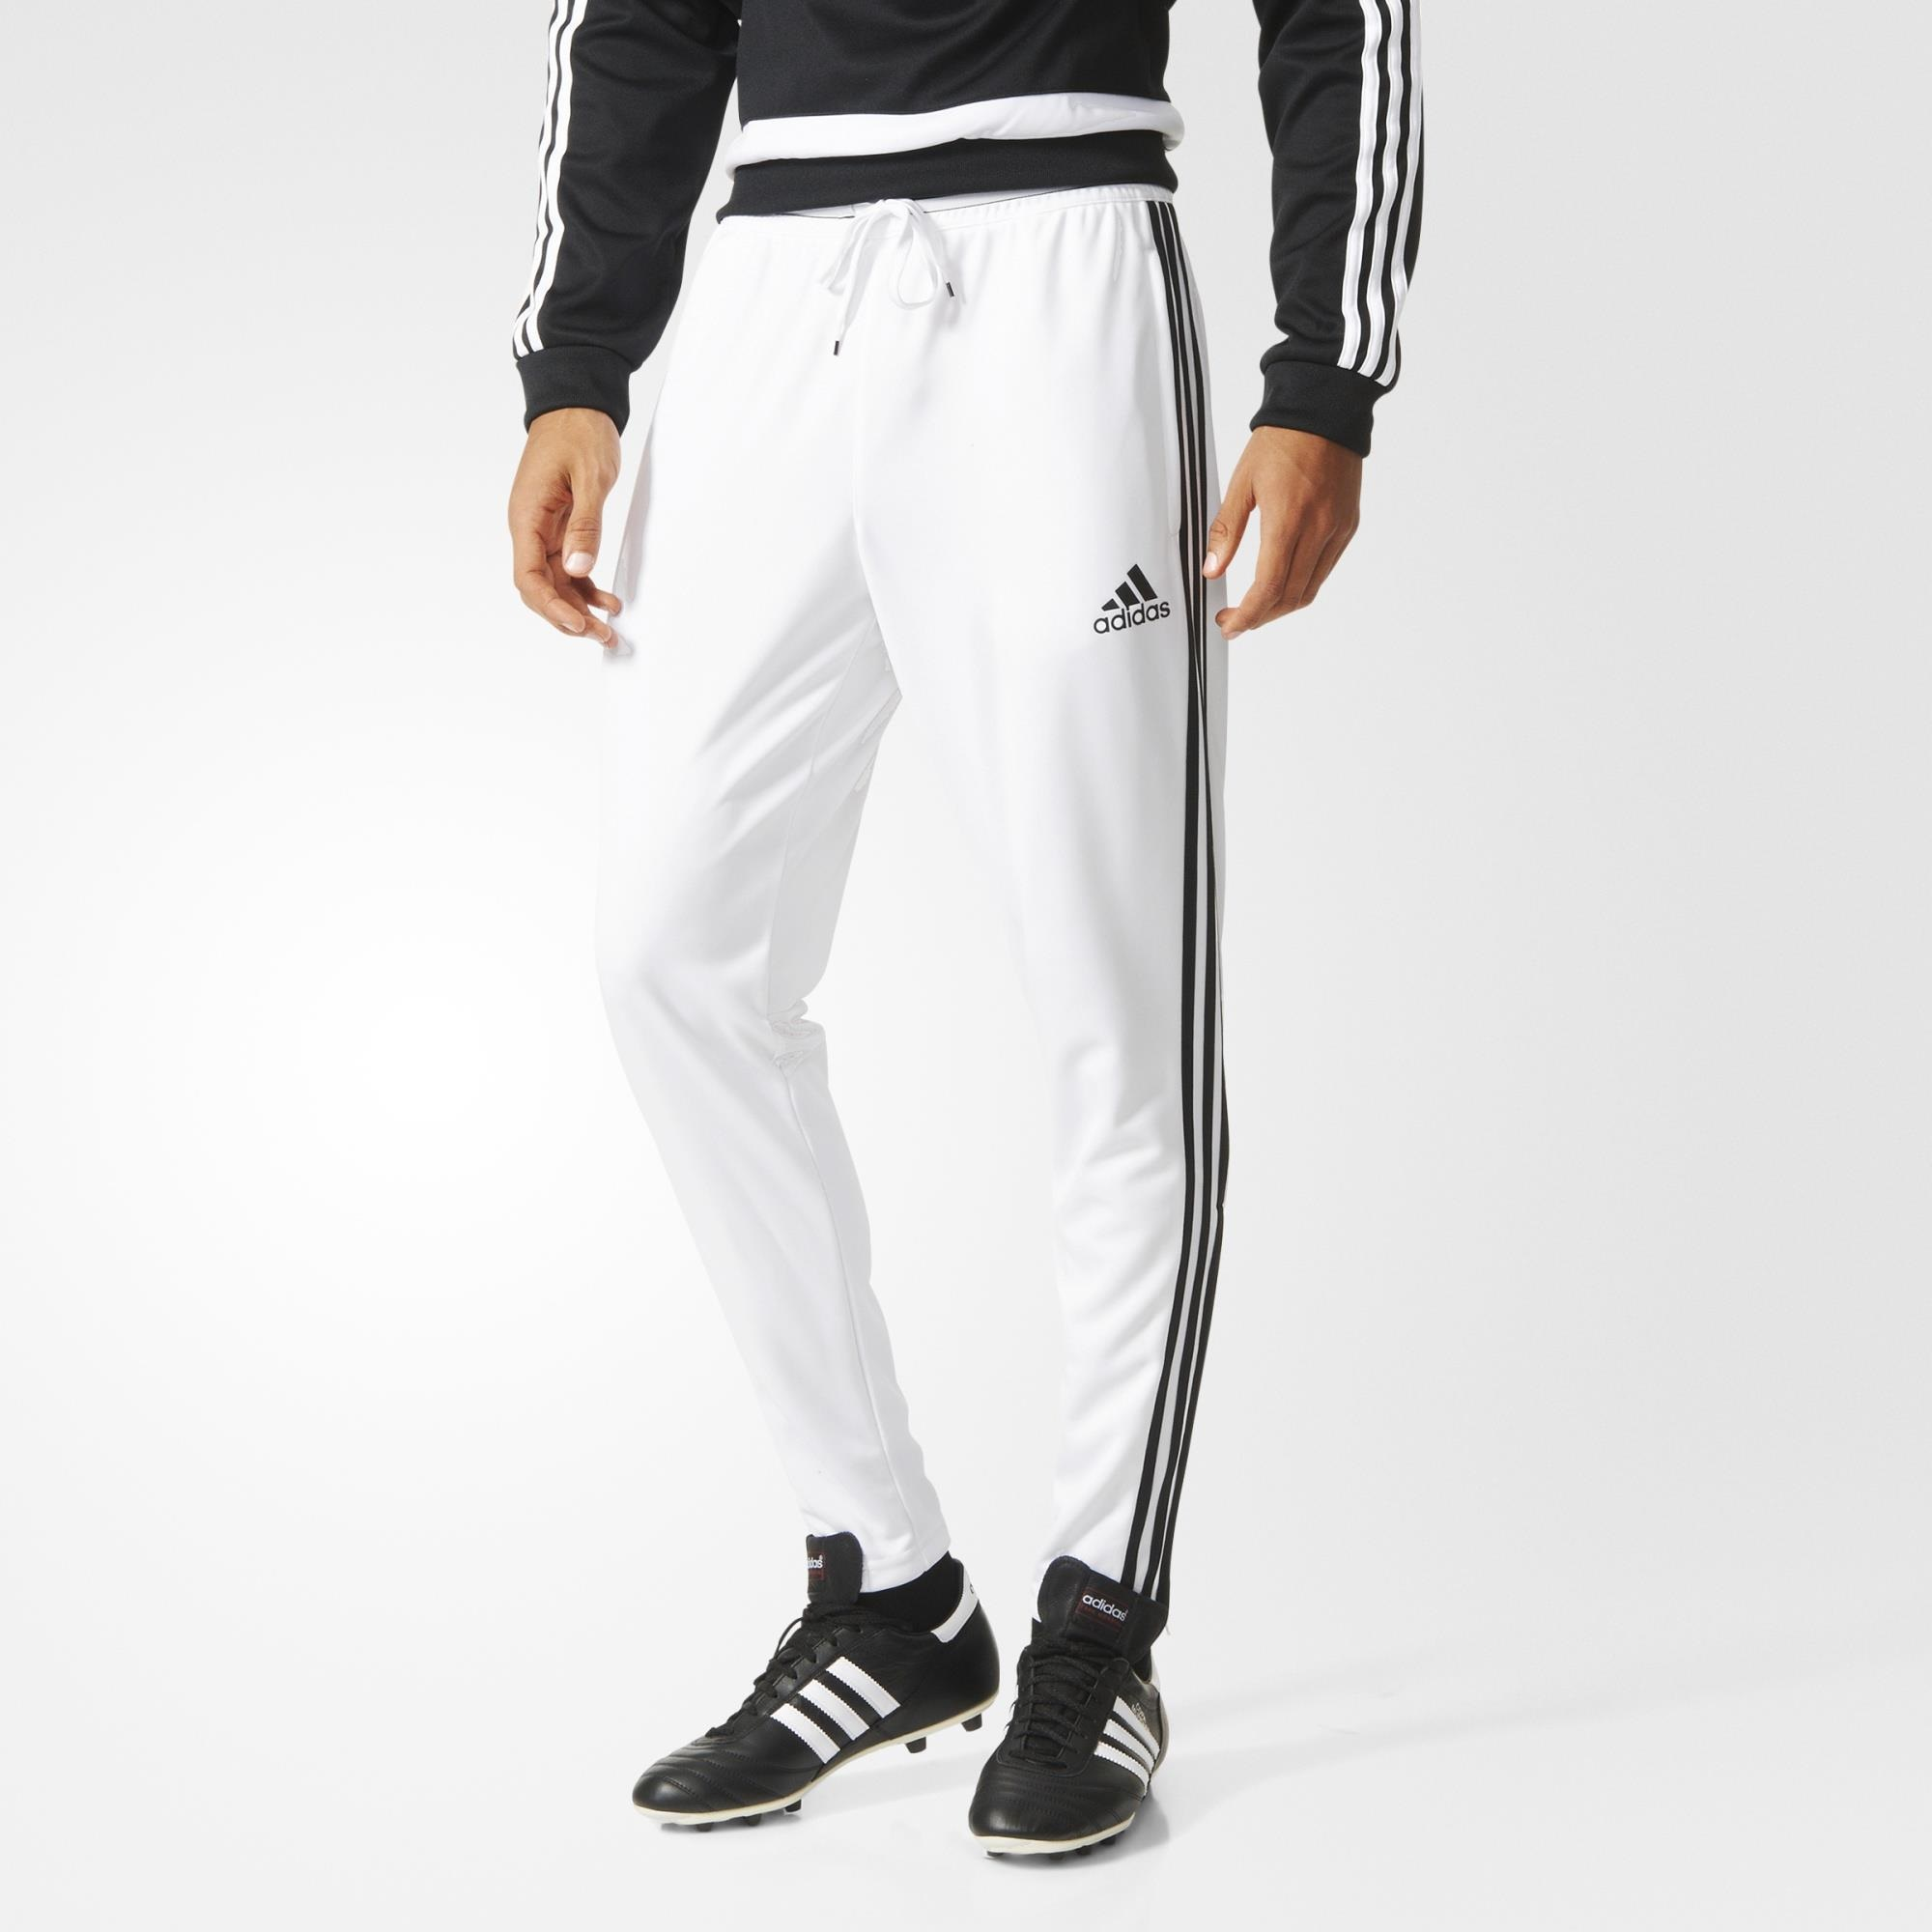 adidas condivo16 training pants white adidas us. Black Bedroom Furniture Sets. Home Design Ideas